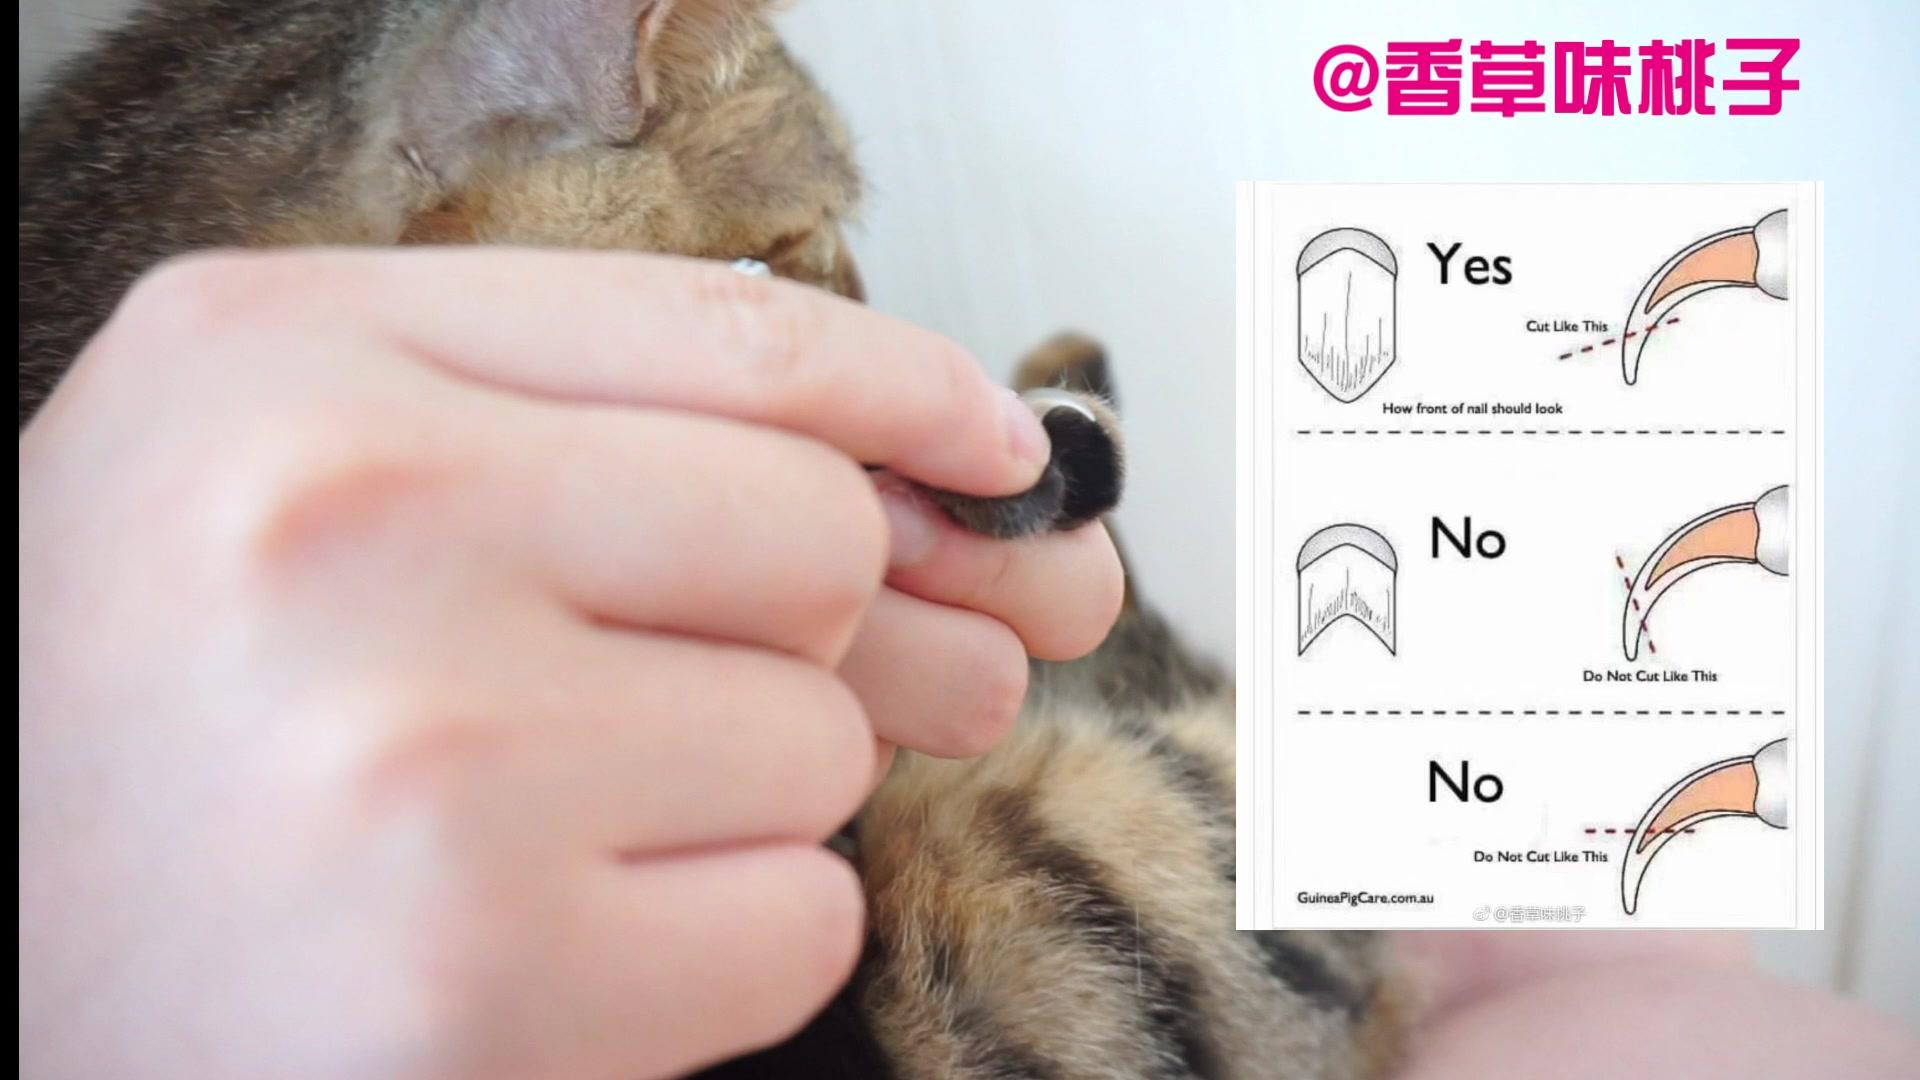 【桃子】如何一個人給貓剪指甲@香草味桃子_嗶哩嗶哩 (゜-゜)つロ 干杯~-bilibili